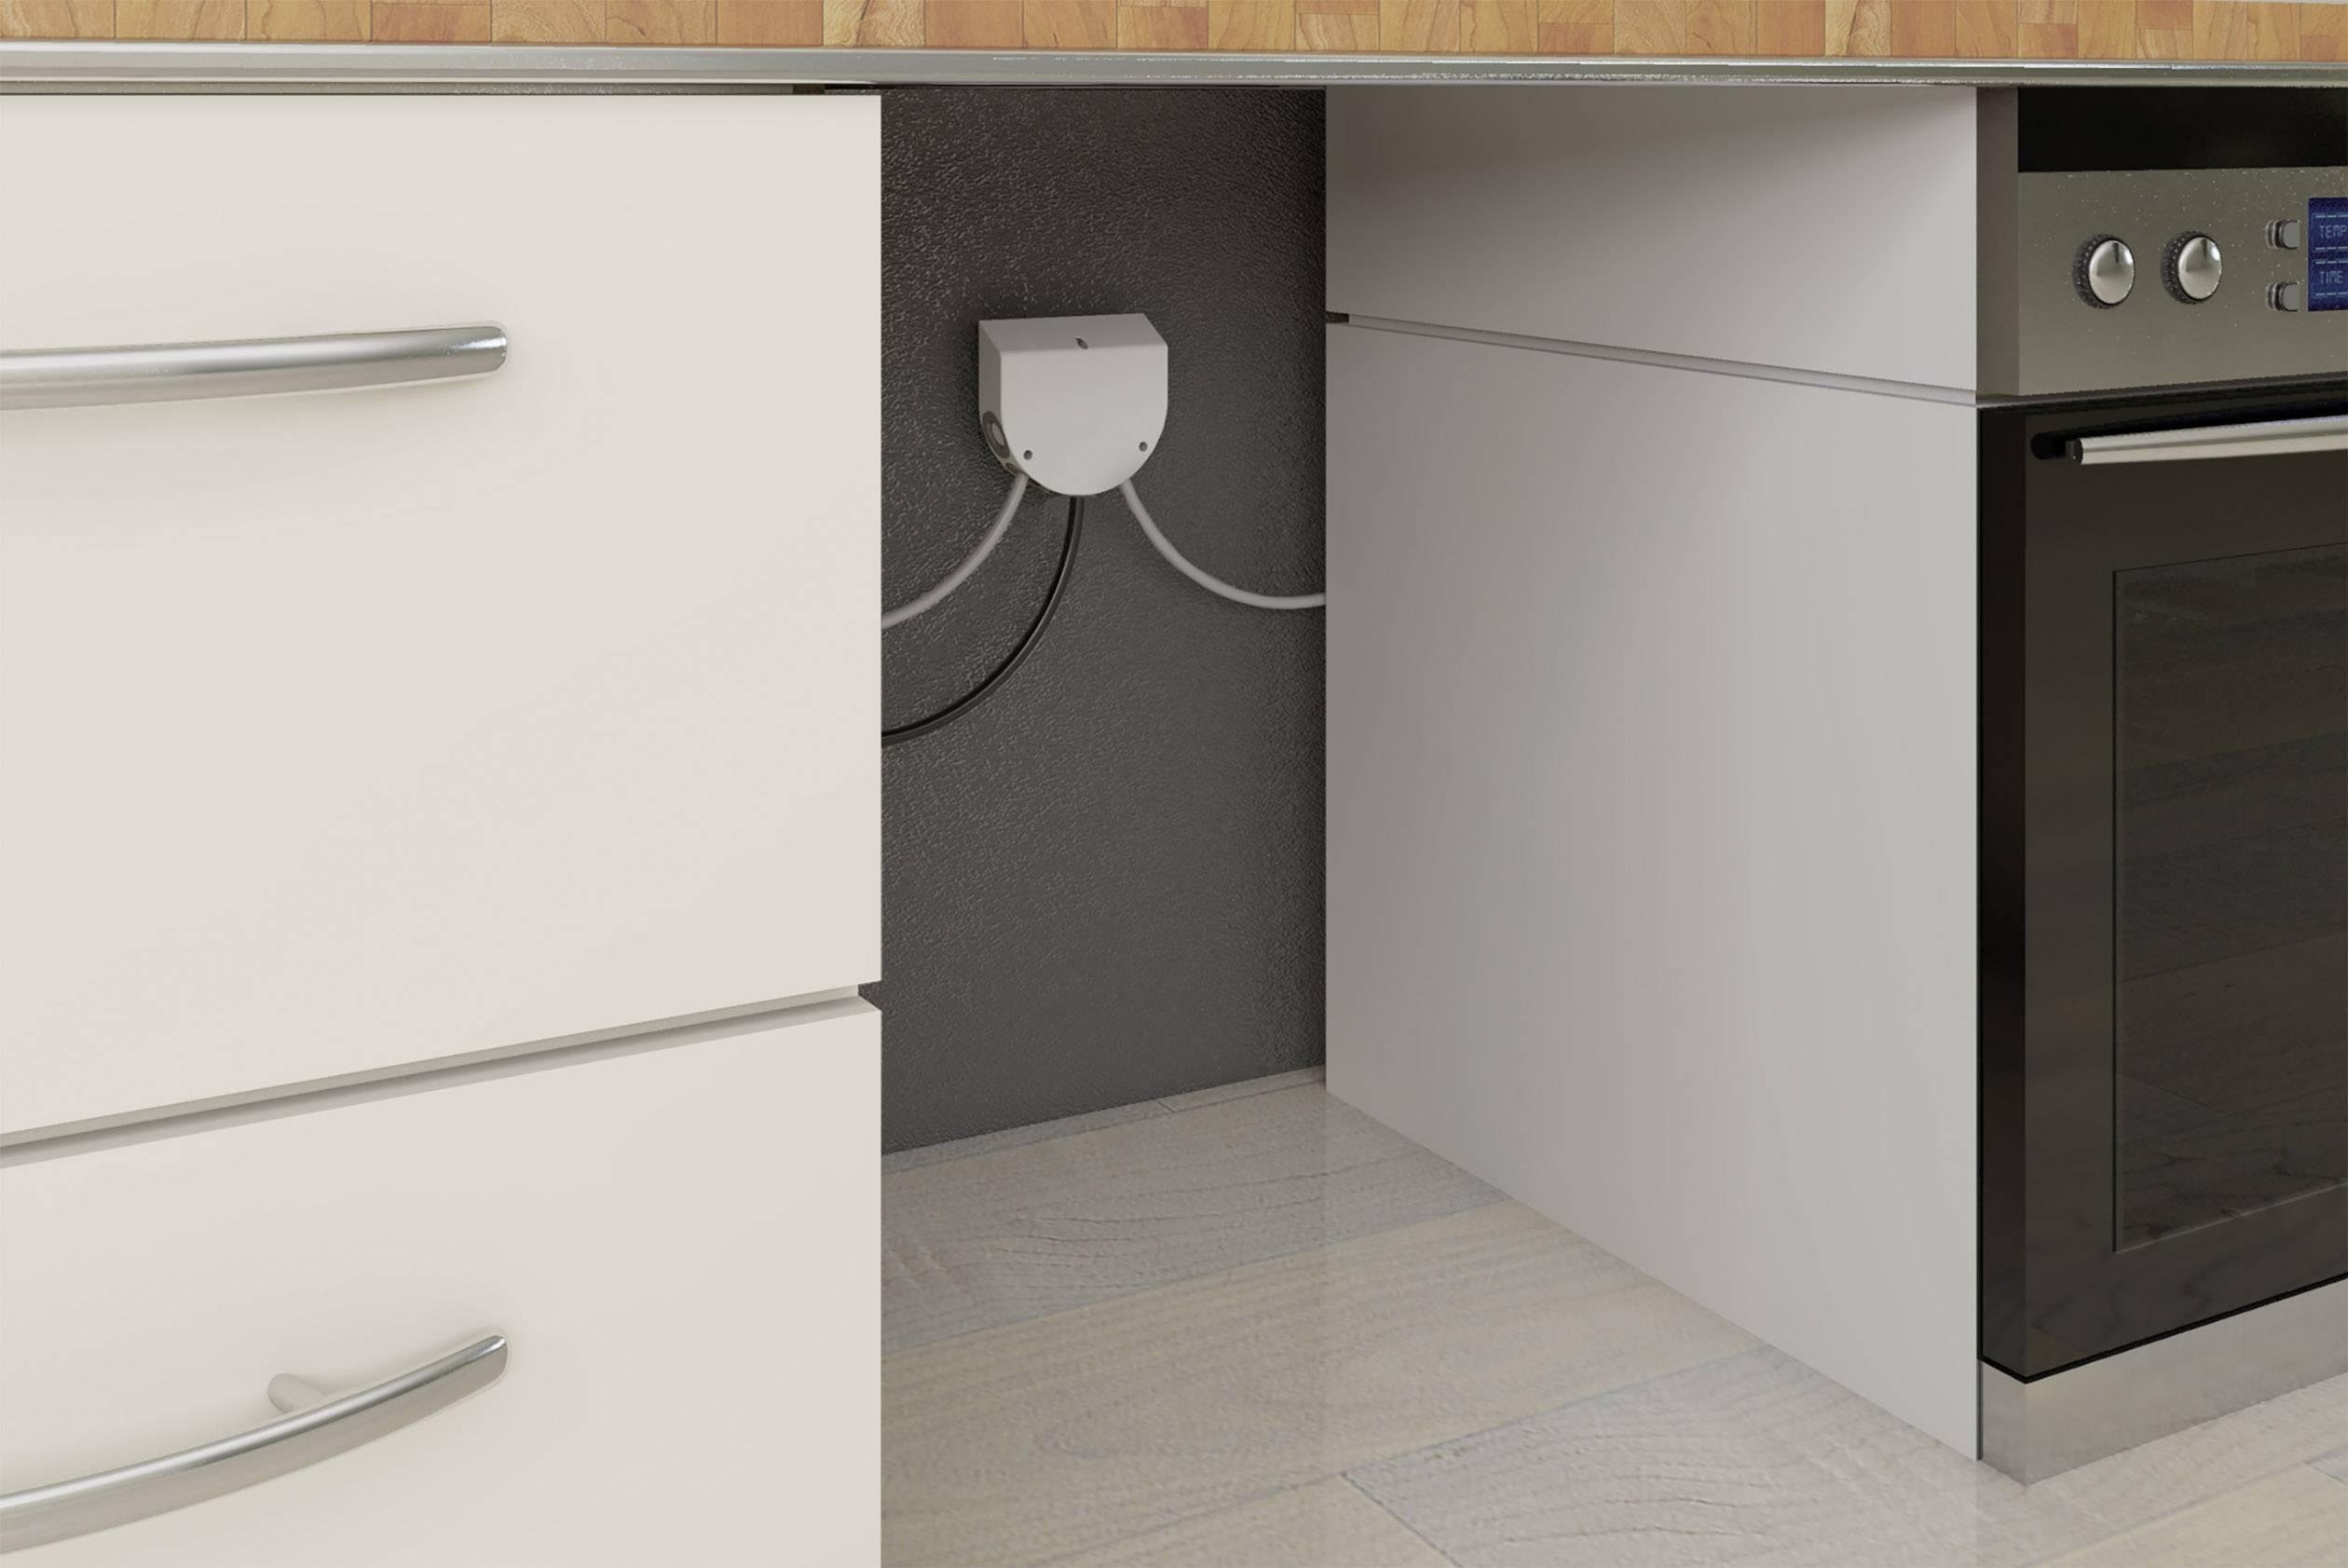 herdanschluss kochfeld und backofen backofen mit autarkem kochfeld und autarkes ceranfeld. Black Bedroom Furniture Sets. Home Design Ideas